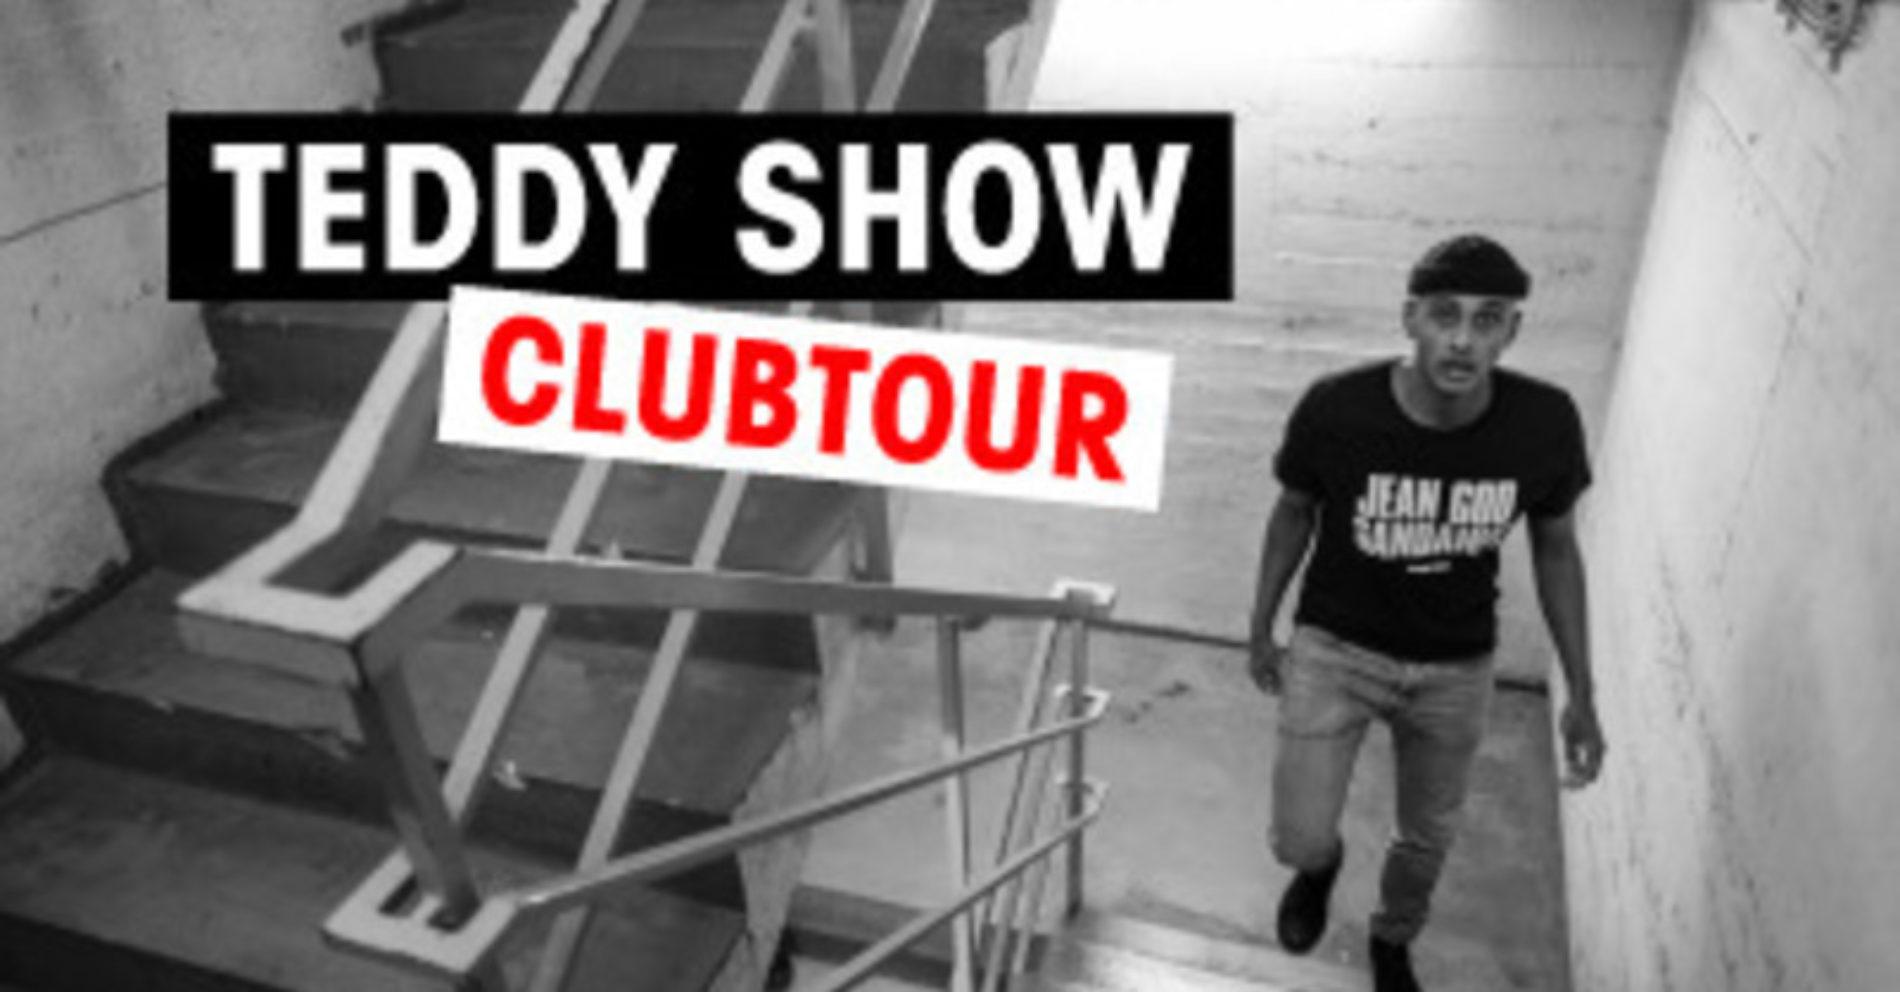 Die Teddy Show – Clubtour